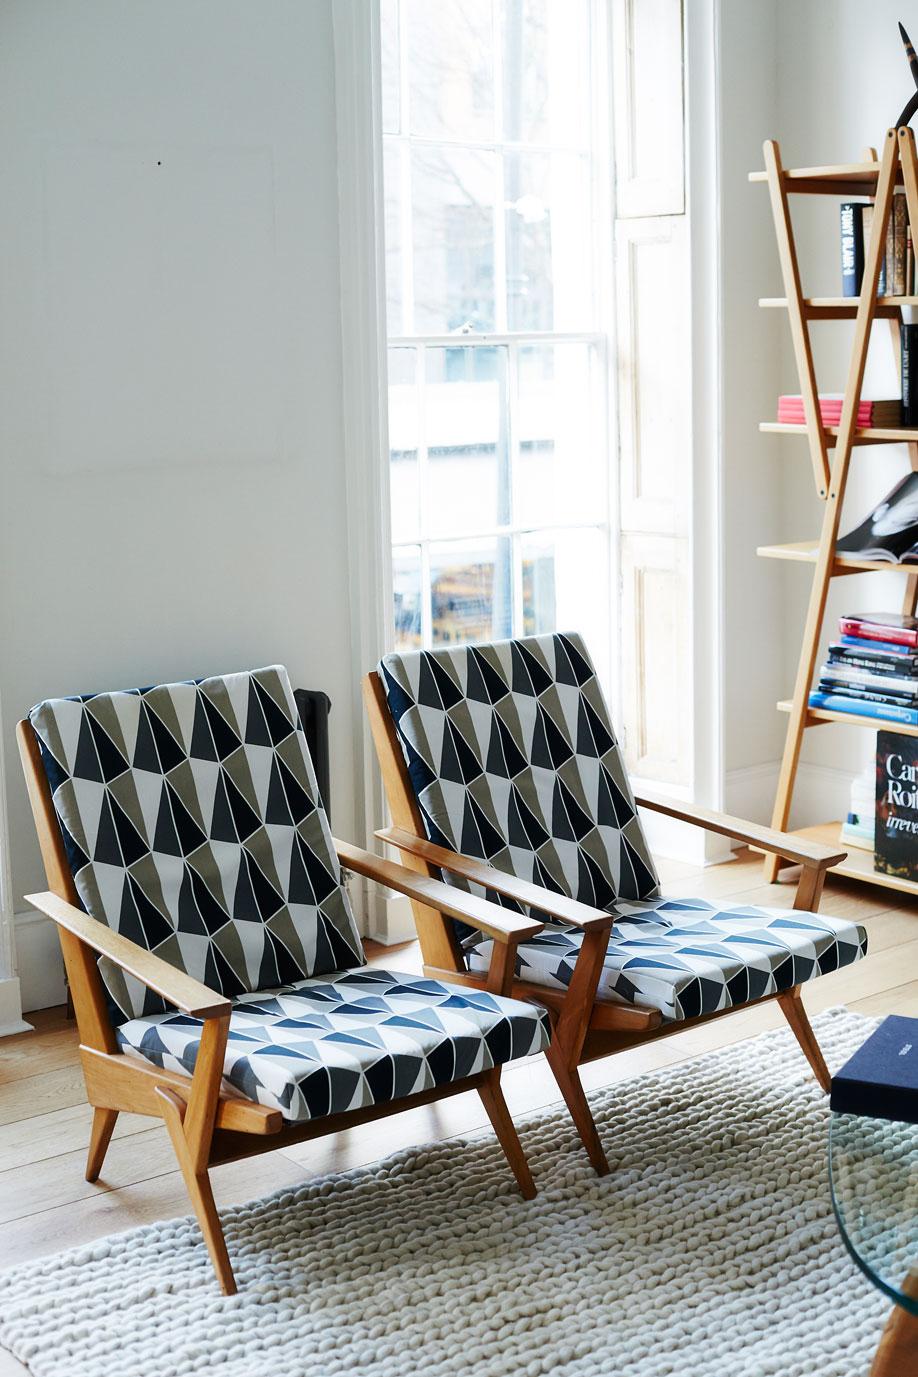 Casa-vintage, Vintage, Casa, Londra, Moda, Stile, Vestiare-collective